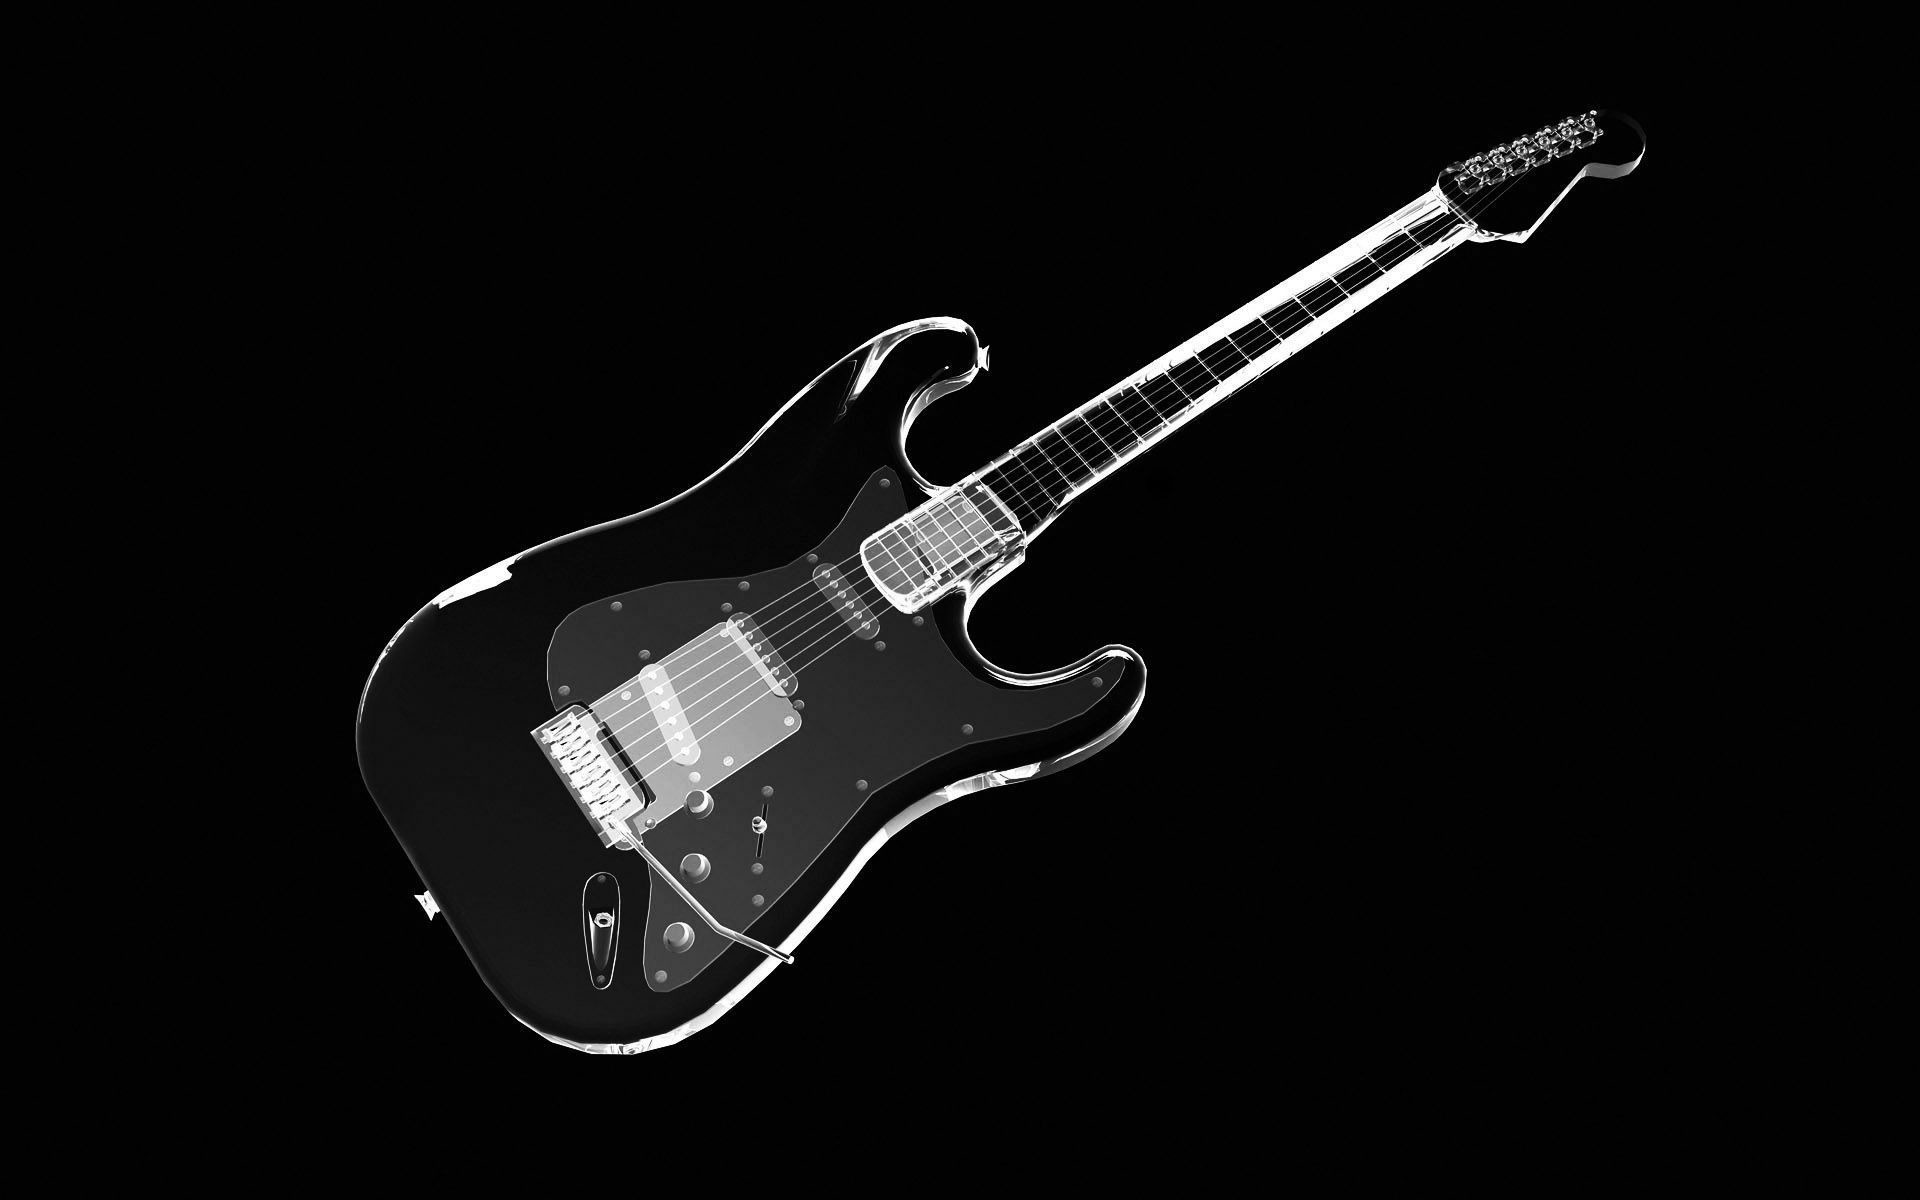 Guitar Black Backgrounds – Wallpaper Cave